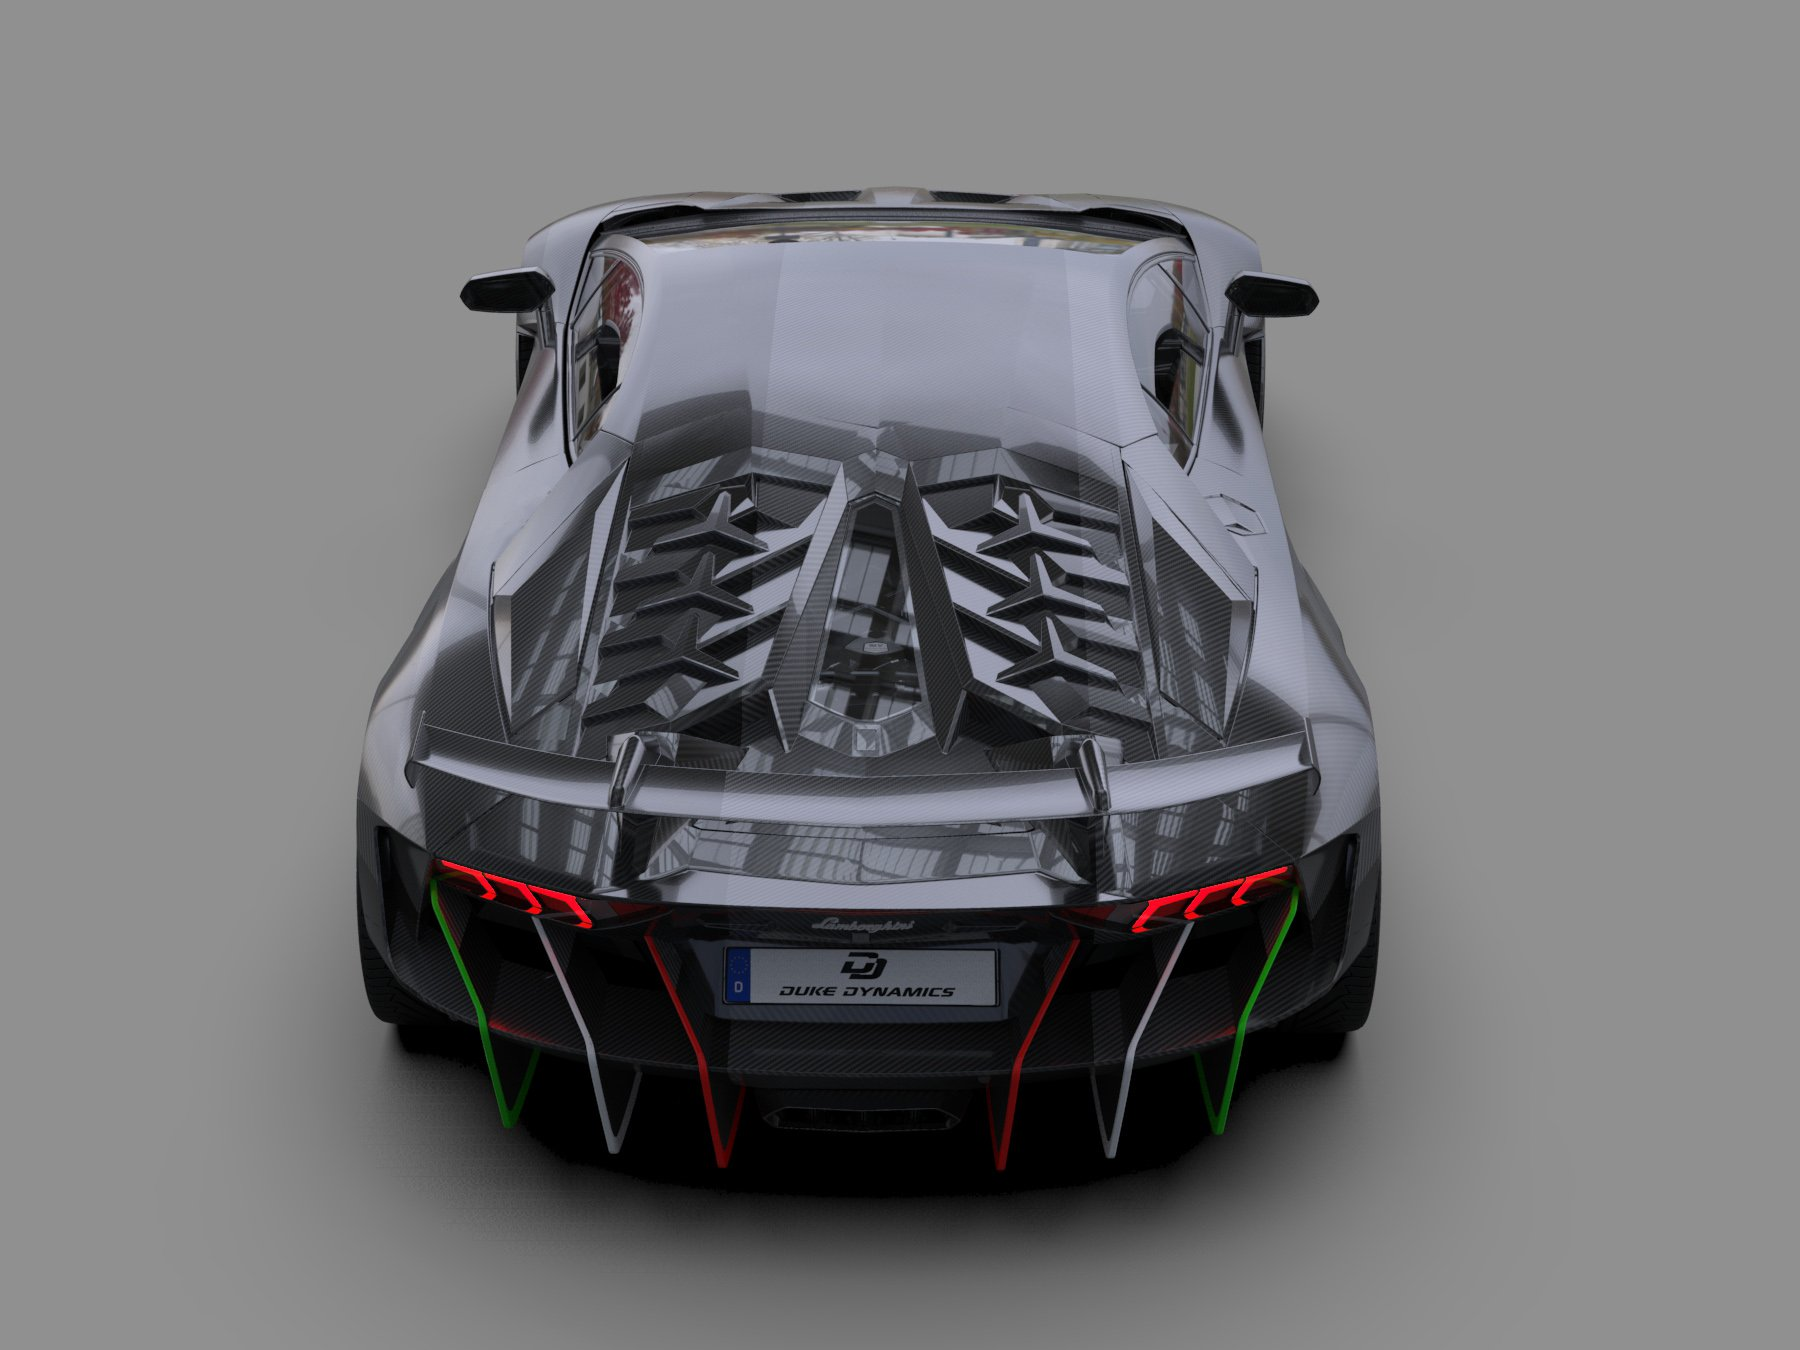 Lamborghini_Aventador_by_Duke_Dynamics_0004